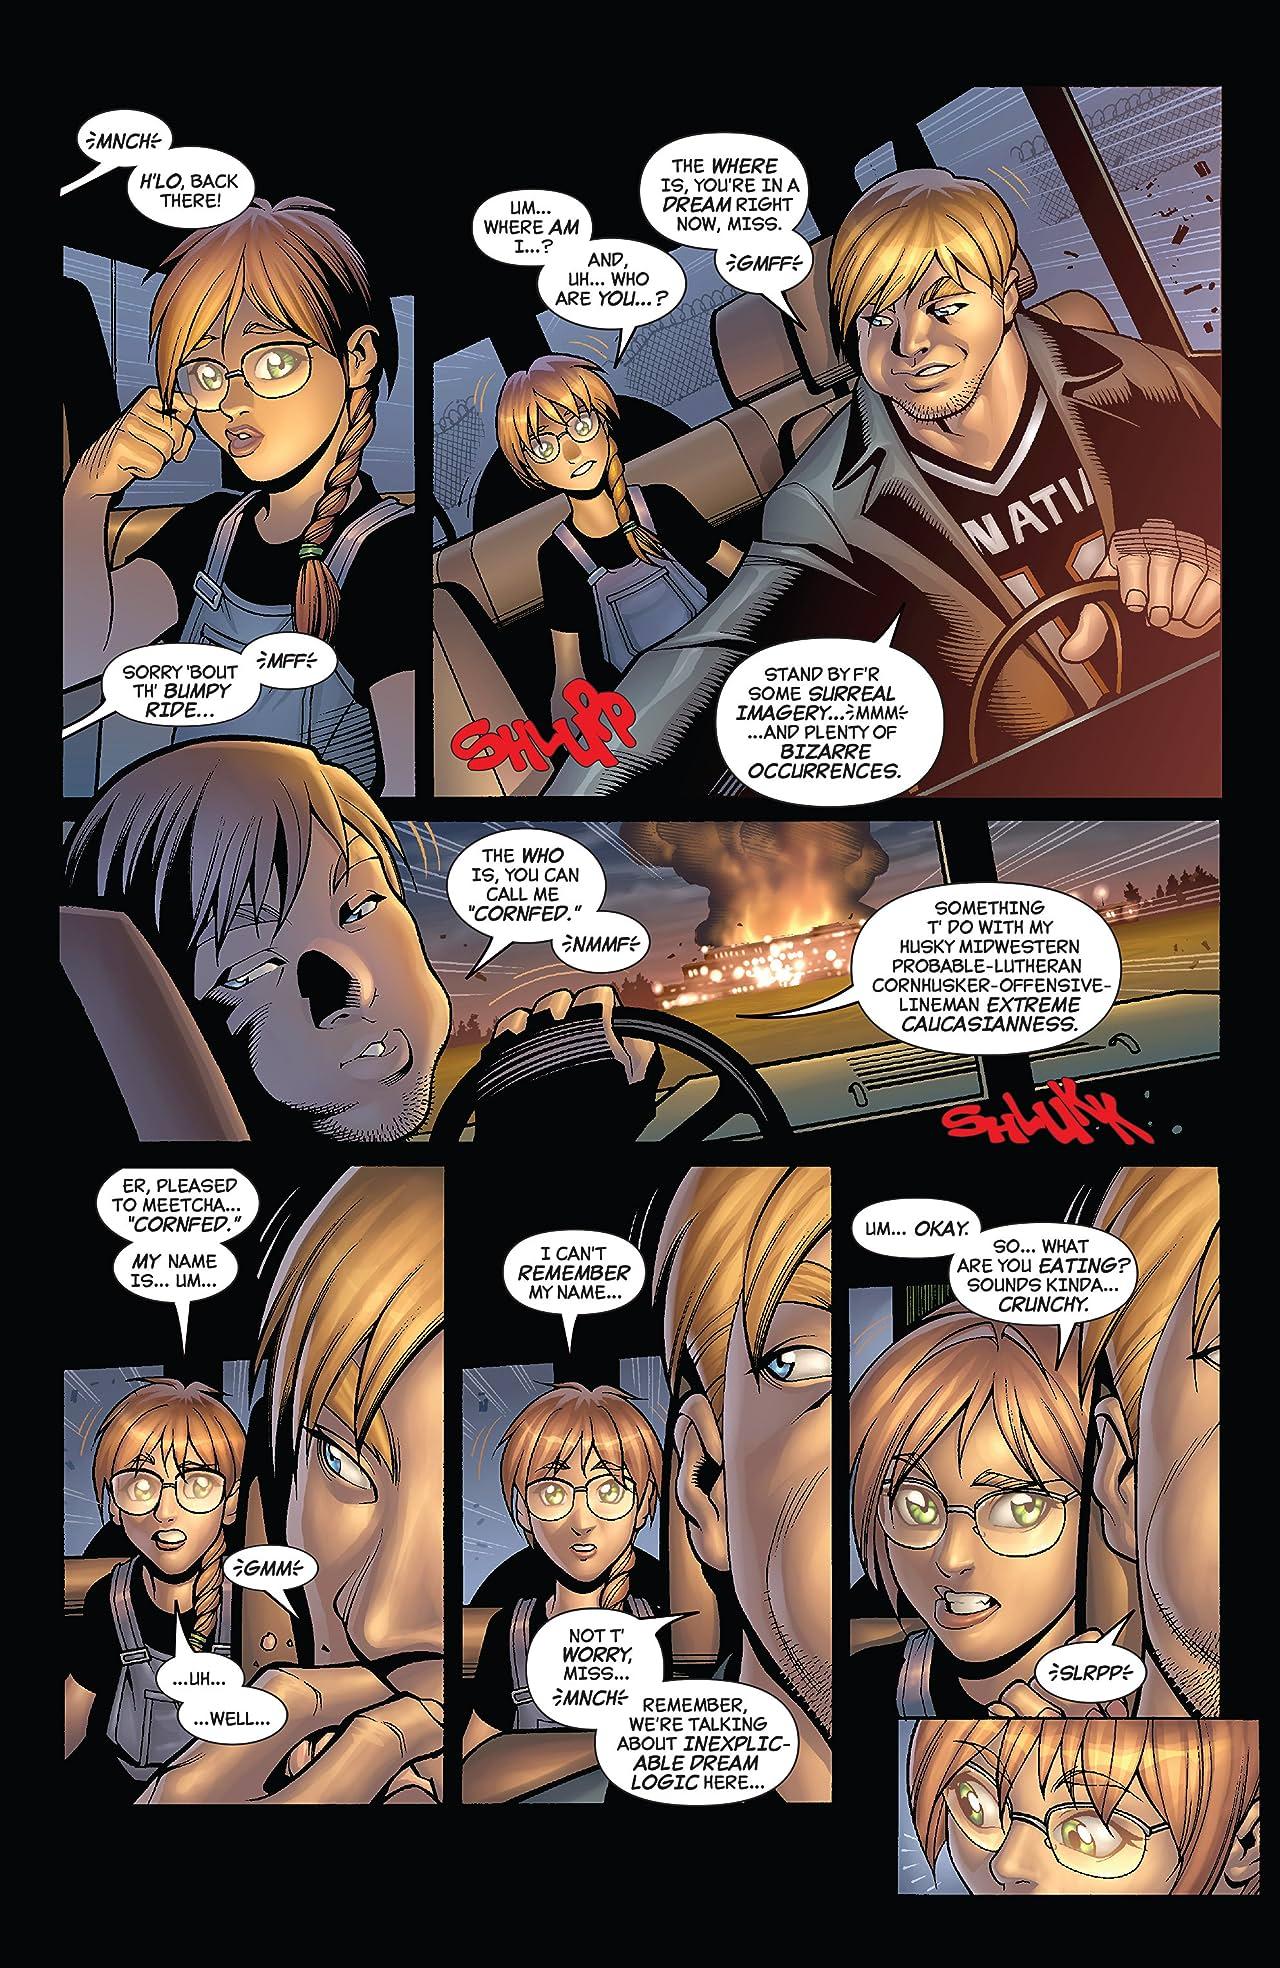 Livewires (2006) #1 (of 6)